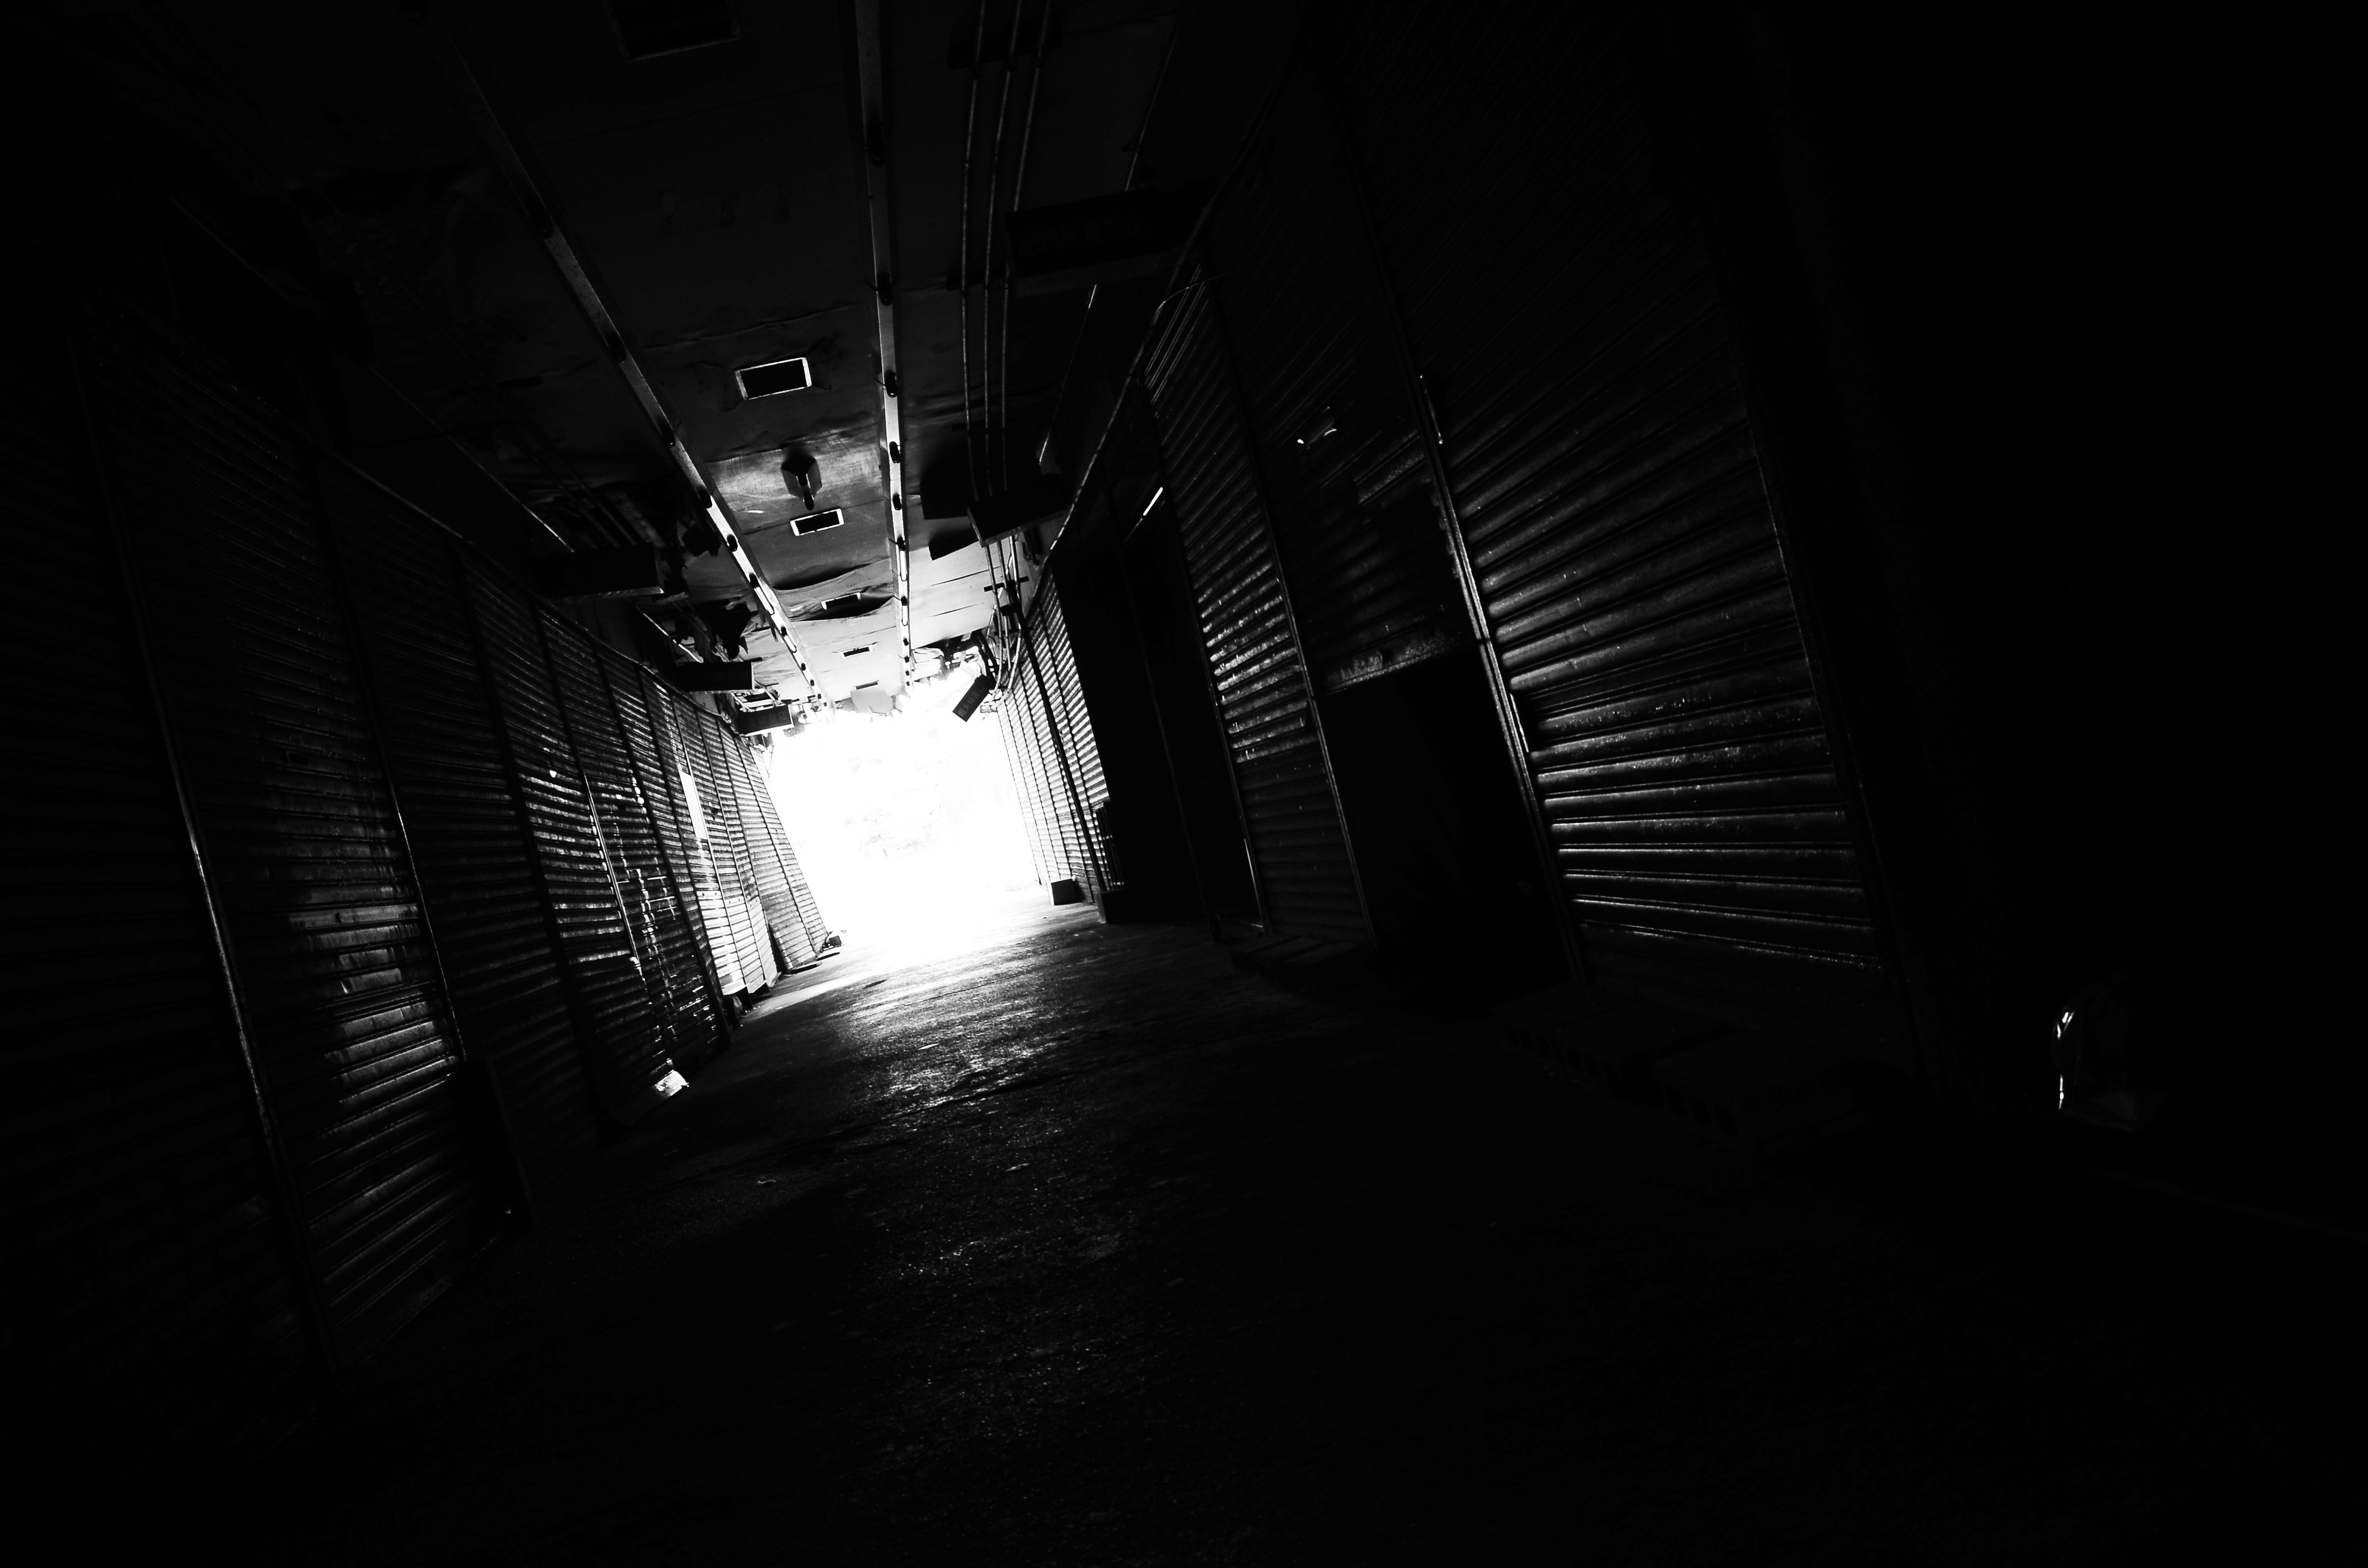 DSC_7745.jpg